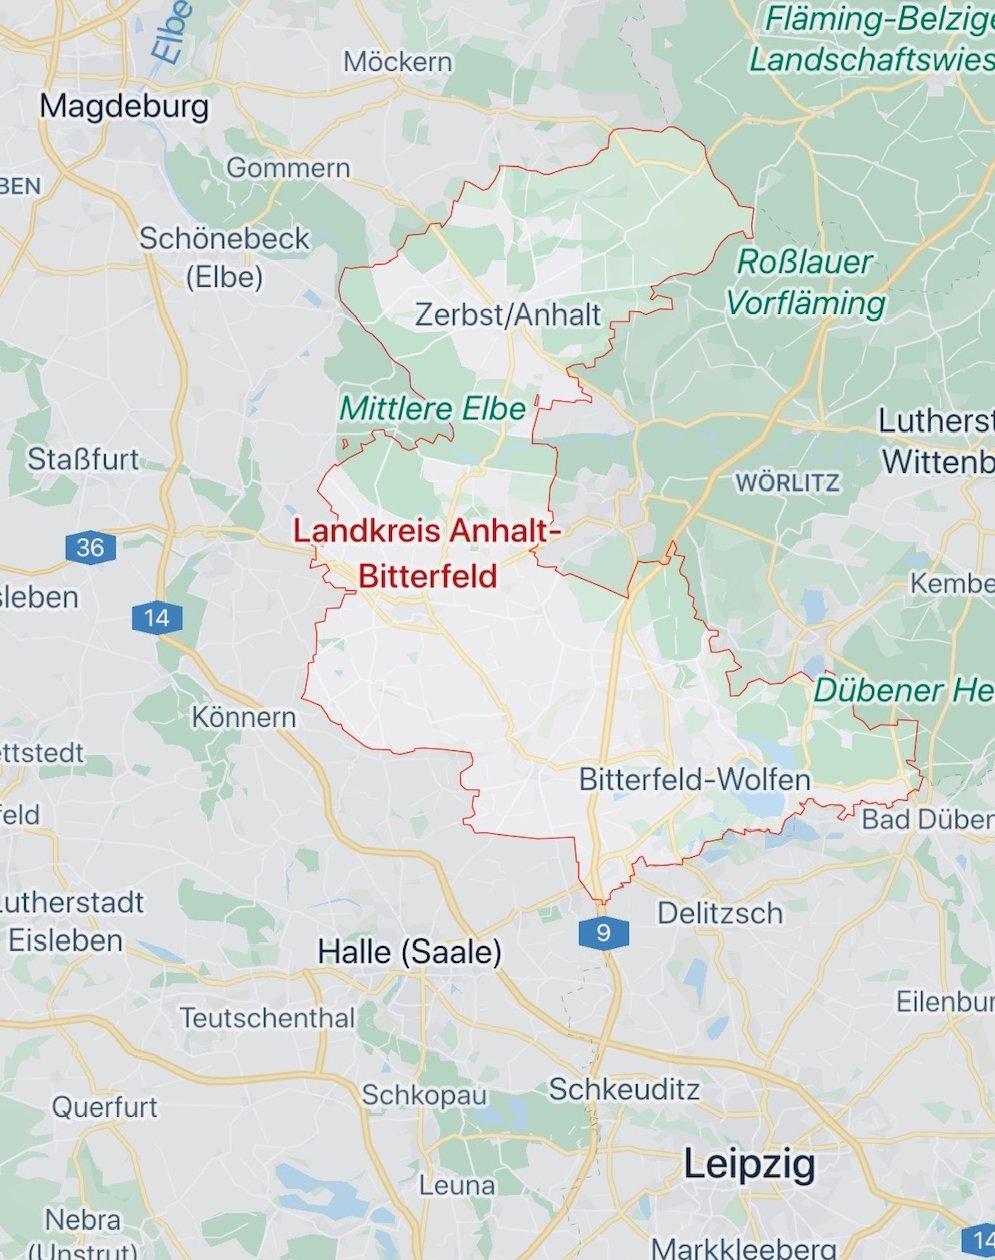 Landkreis_Anhalt-Bitterfeld